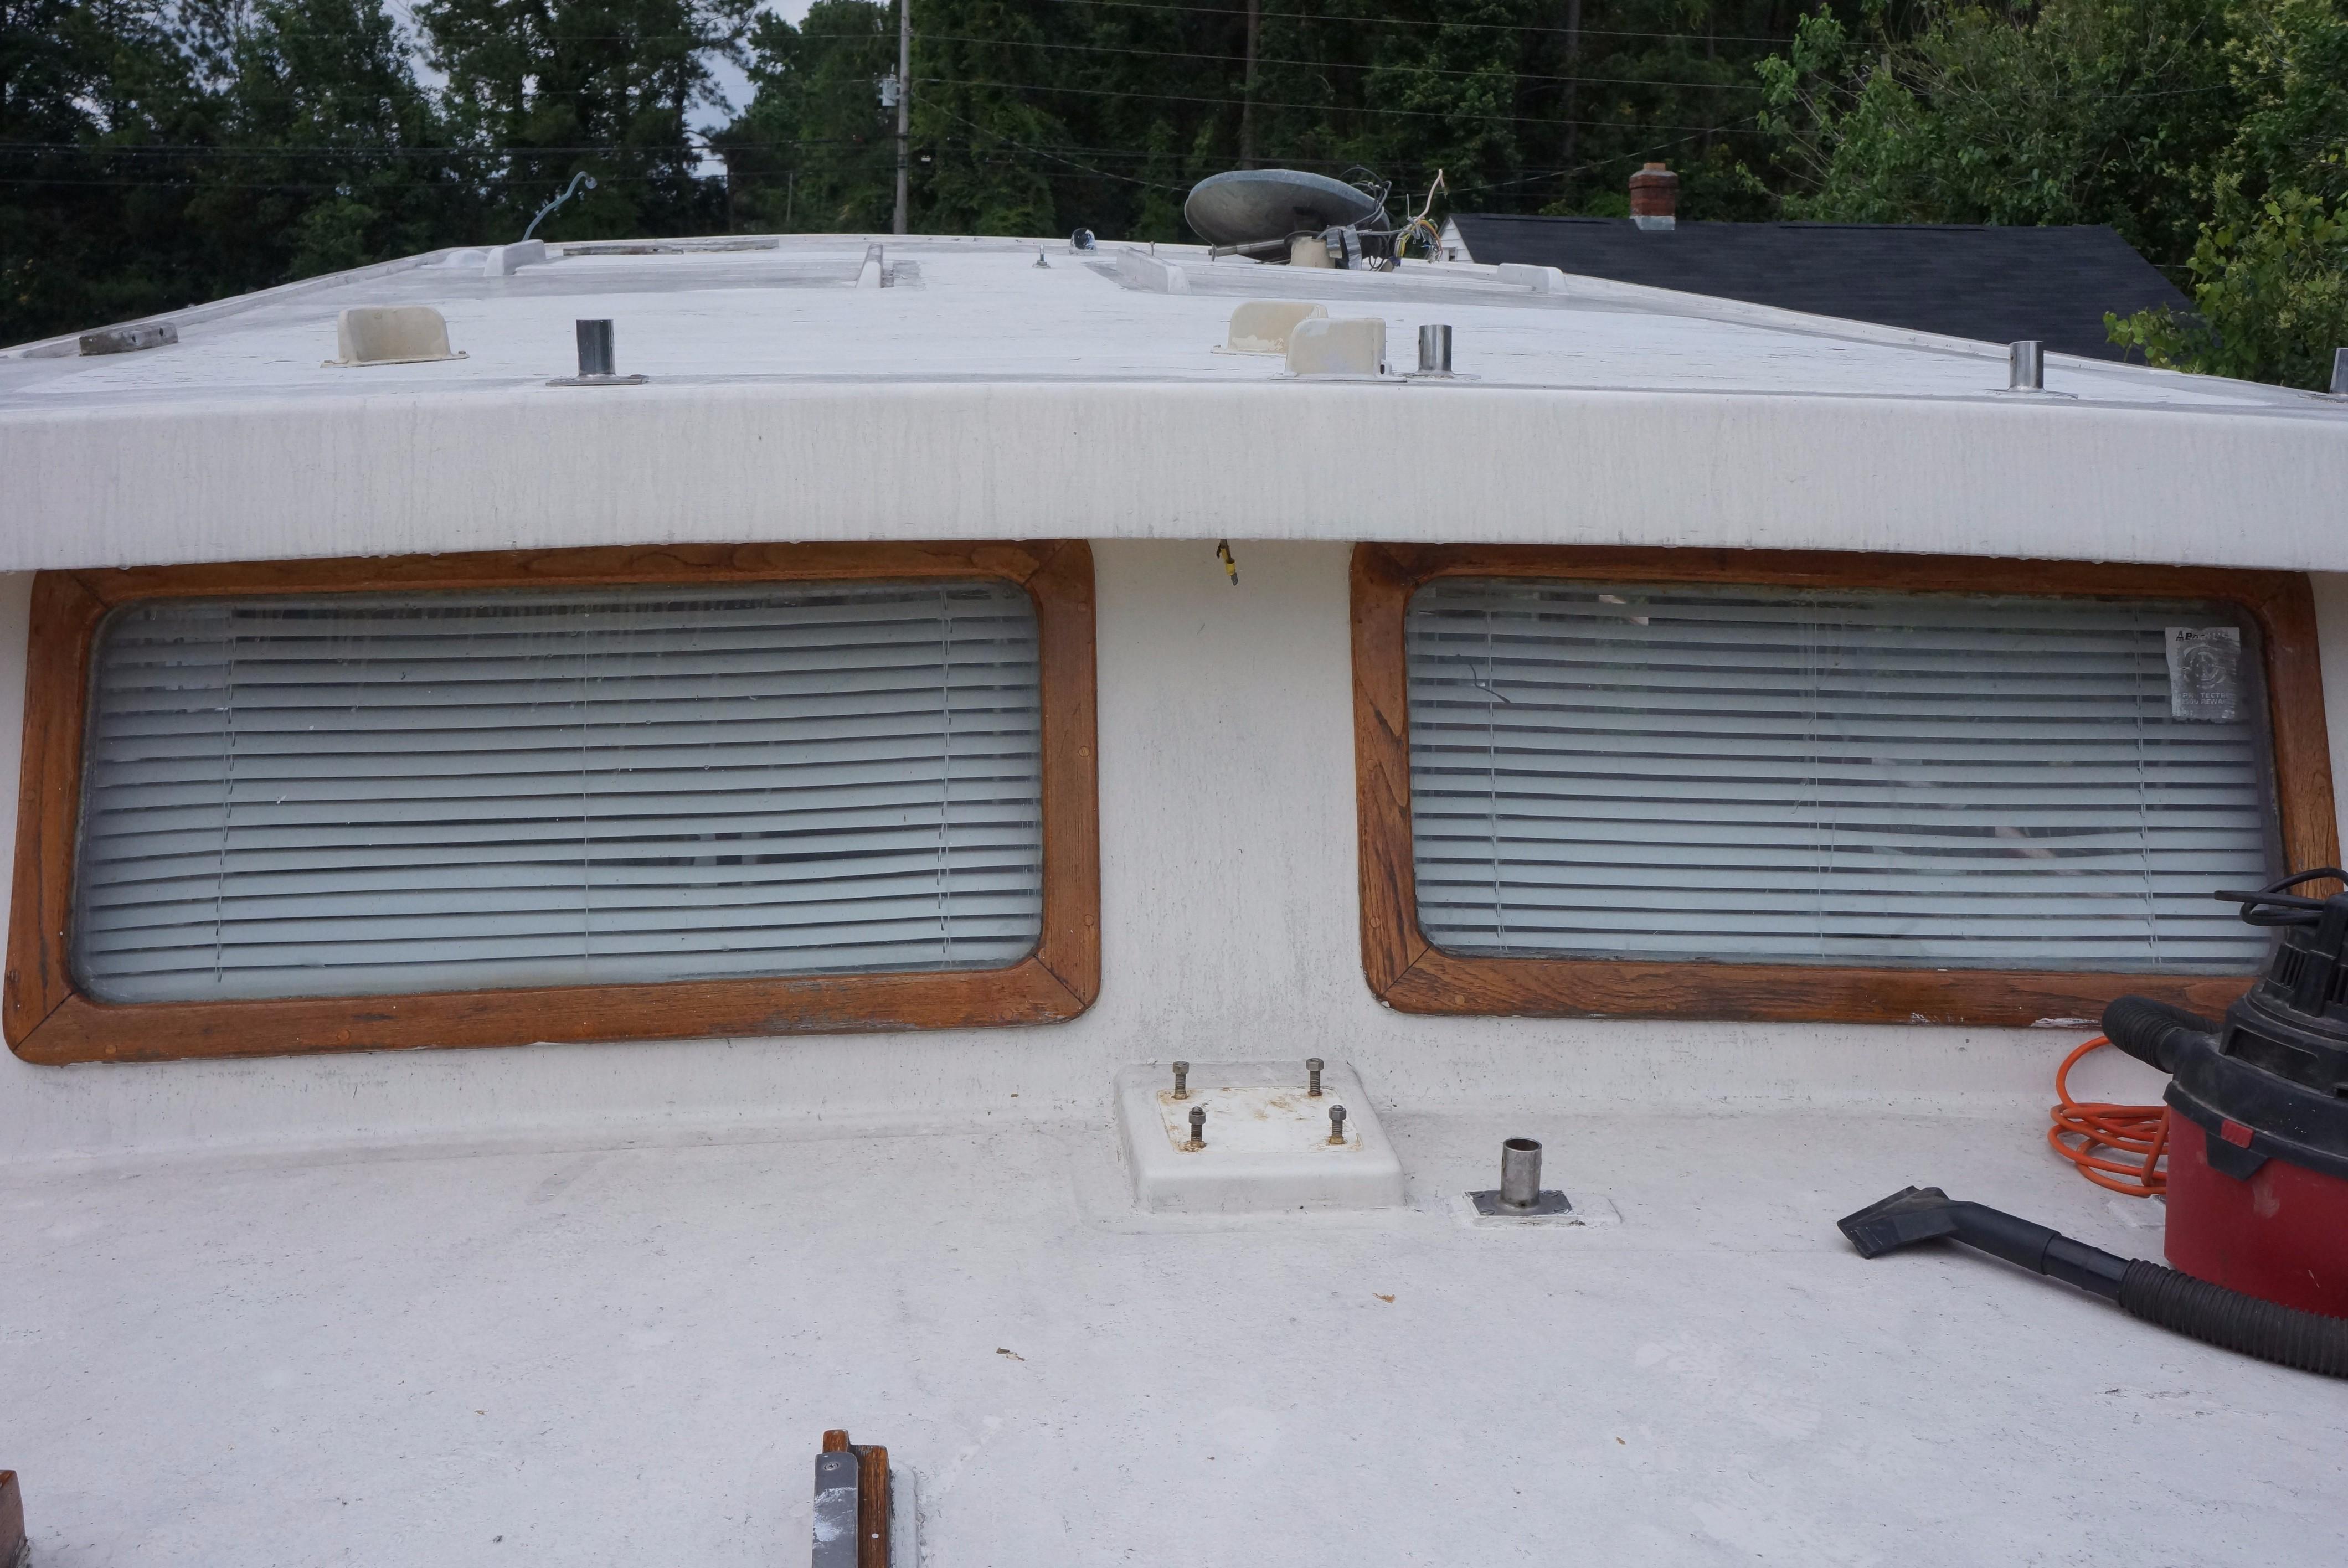 Marine Trader 34 Double Cabin - 34 Marine Trader Hardtop